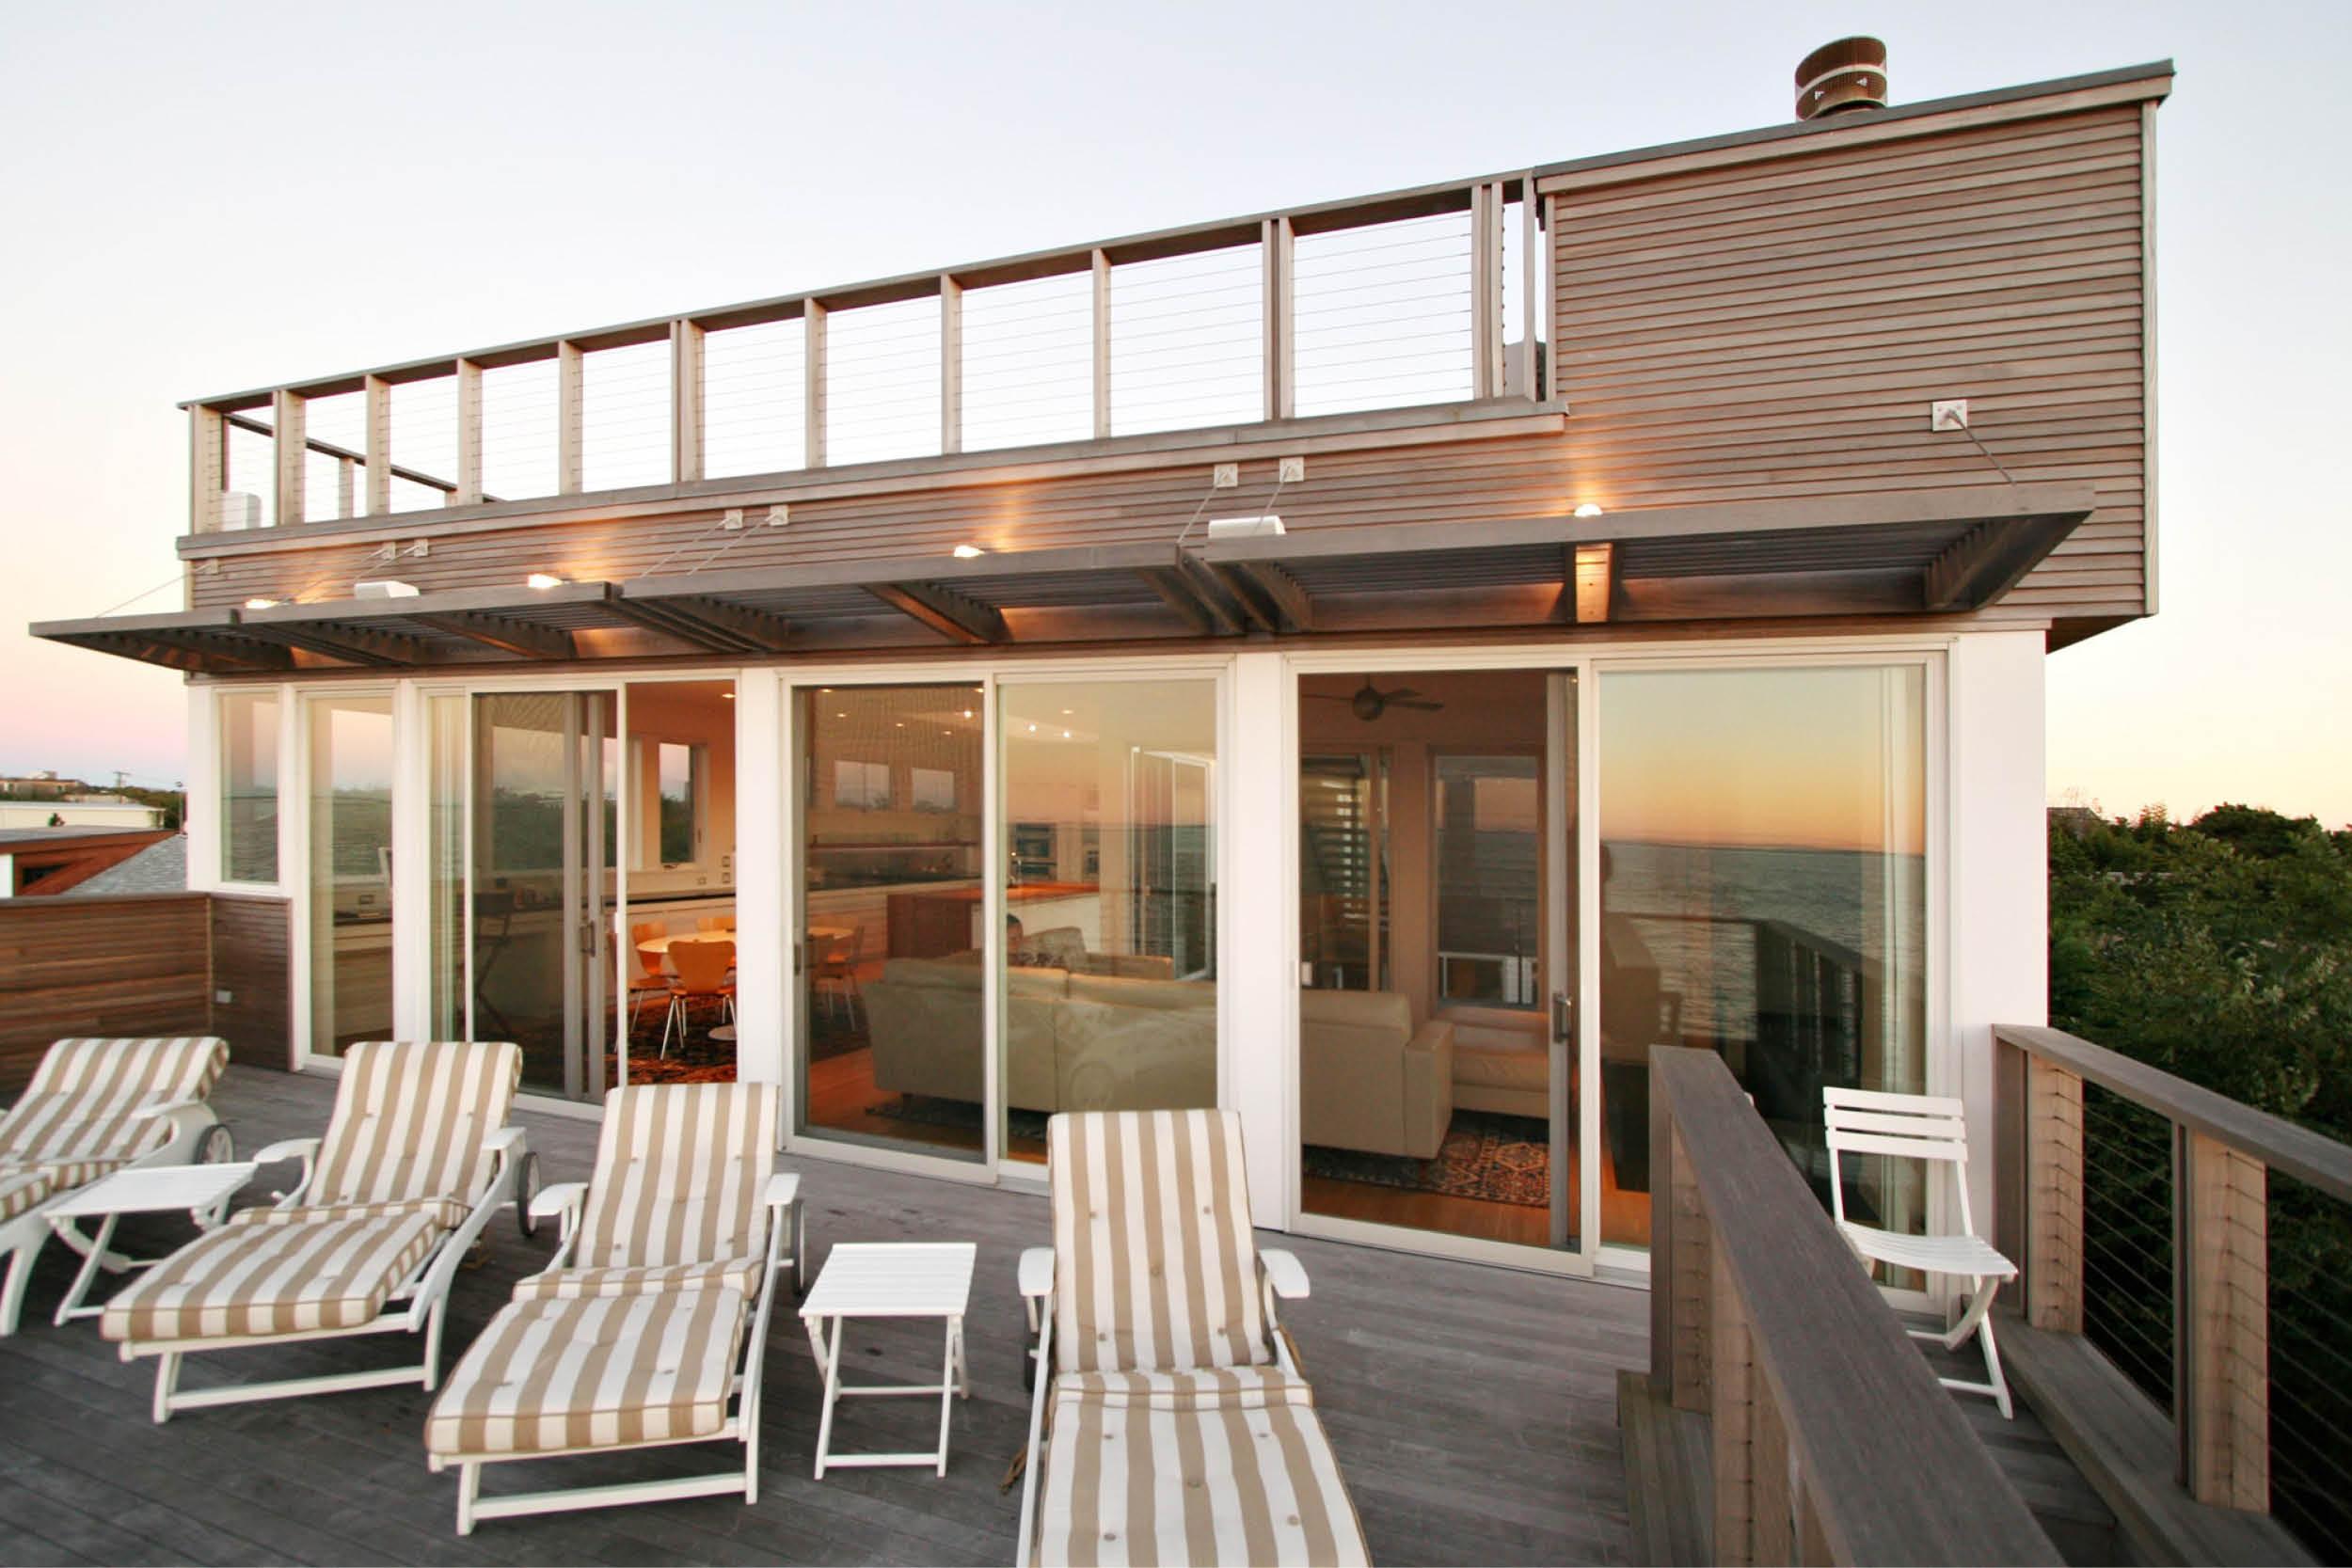 Modern Modular Prefab House | Cedar siding Beach White Windows Deck | Fire Island New York | RES4